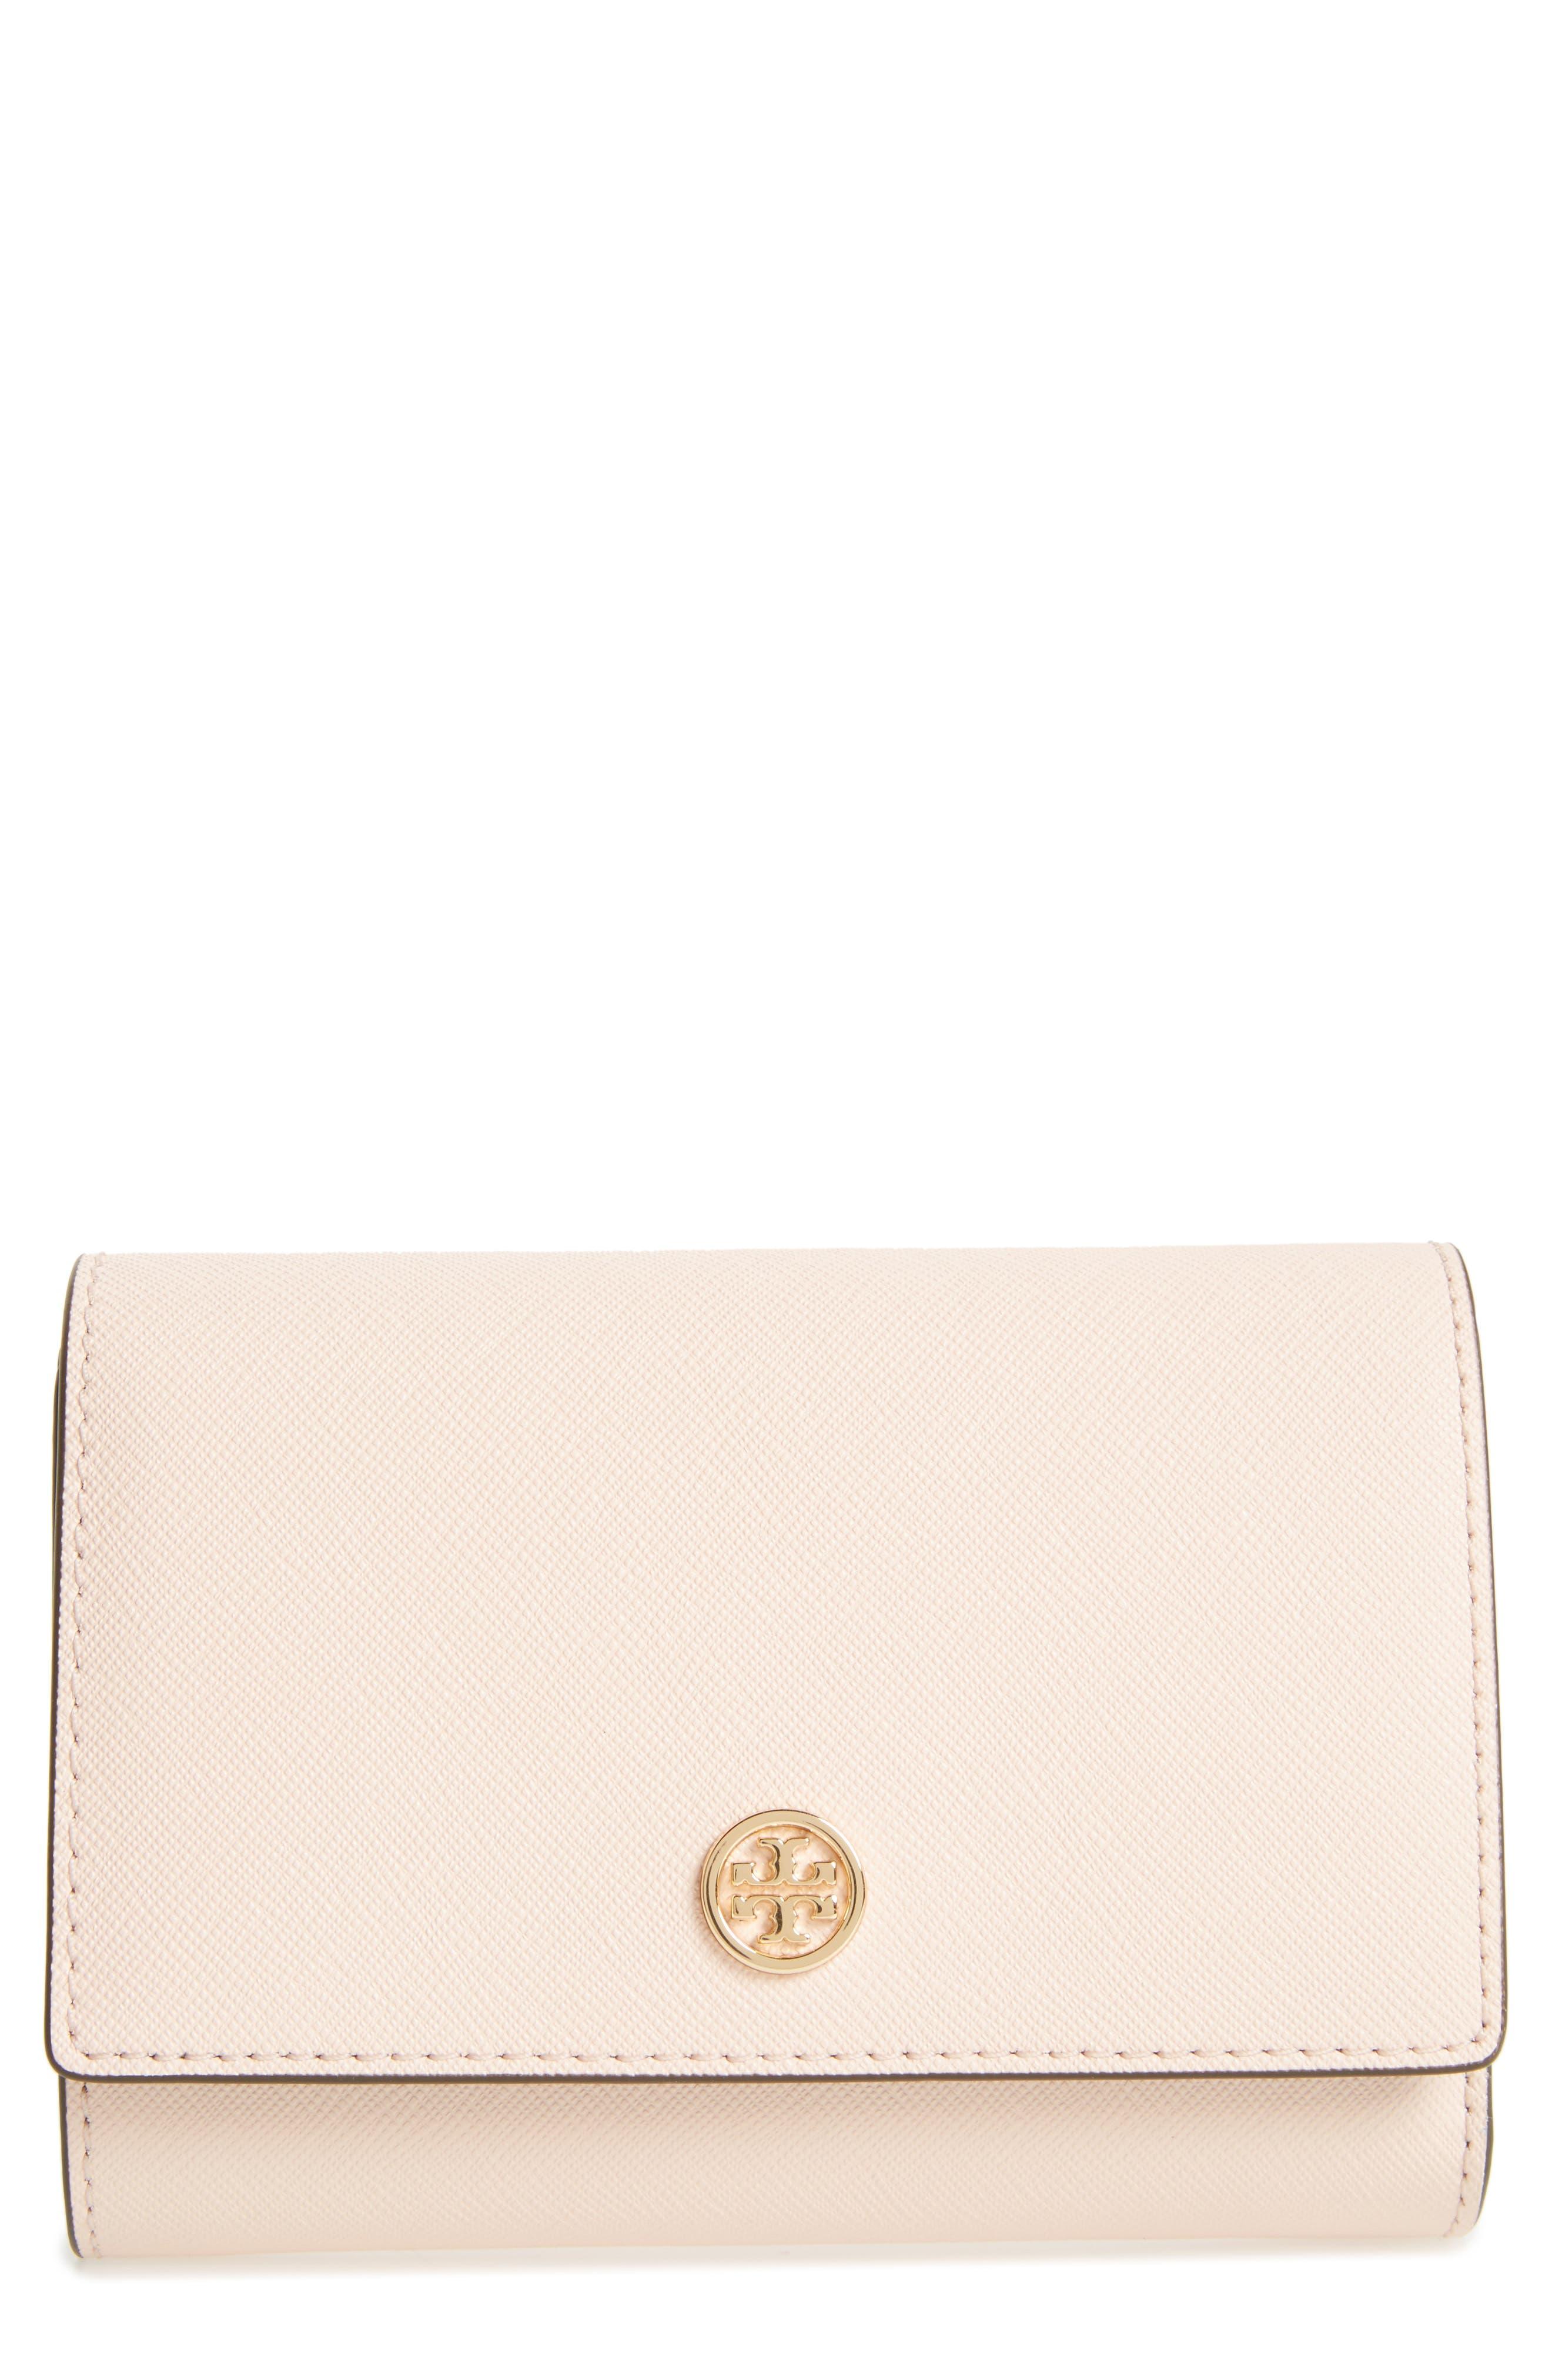 Robinson Medium Leather Wallet,                             Main thumbnail 2, color,